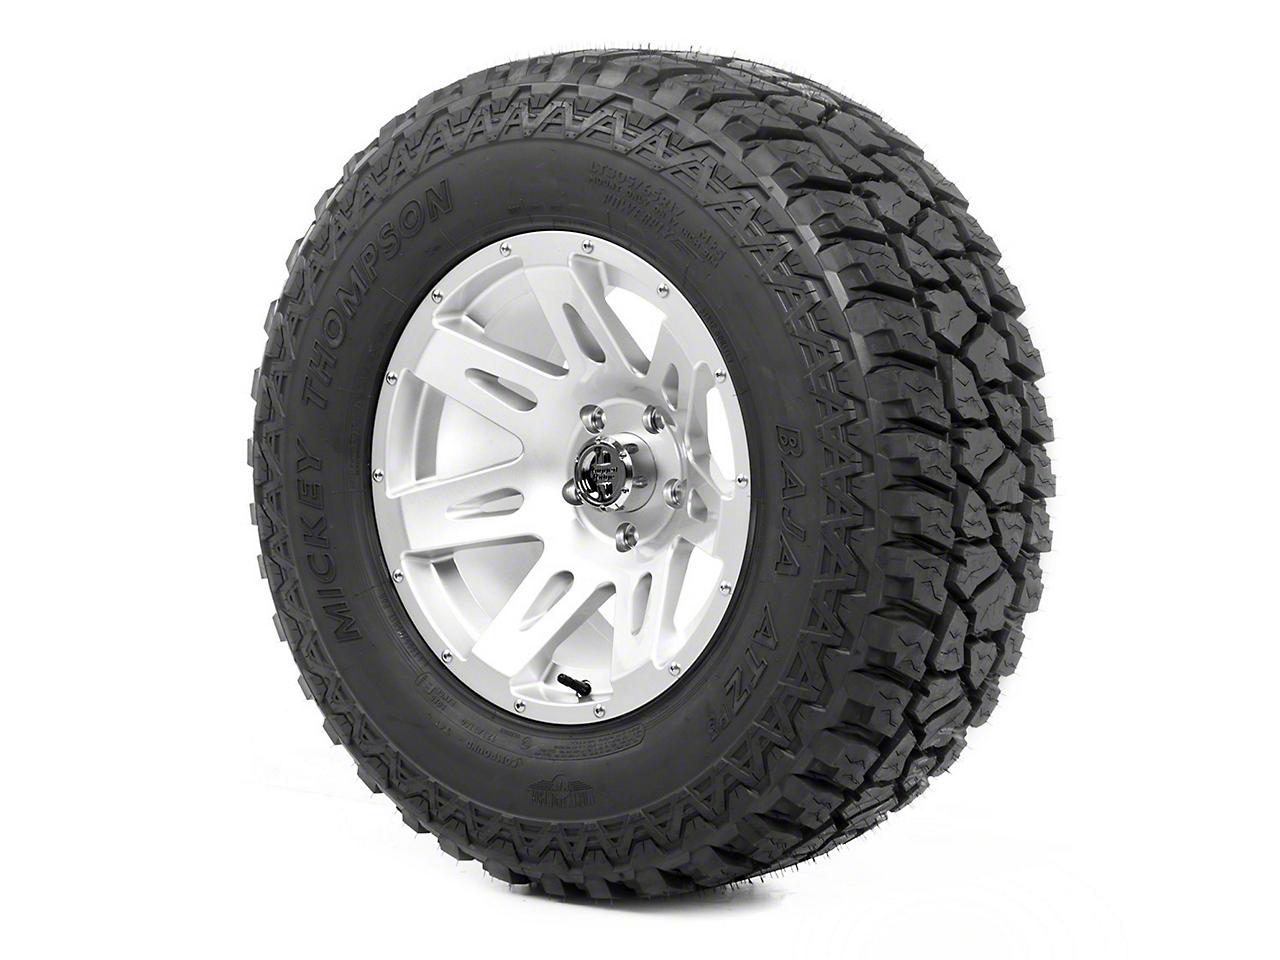 Rugged Ridge XHD Wheel 17x9 Silver and Mickey Thompson ATZ P3 305/65R17 Tire (13-18 Wrangler JK; 2018 Wrangler JL)